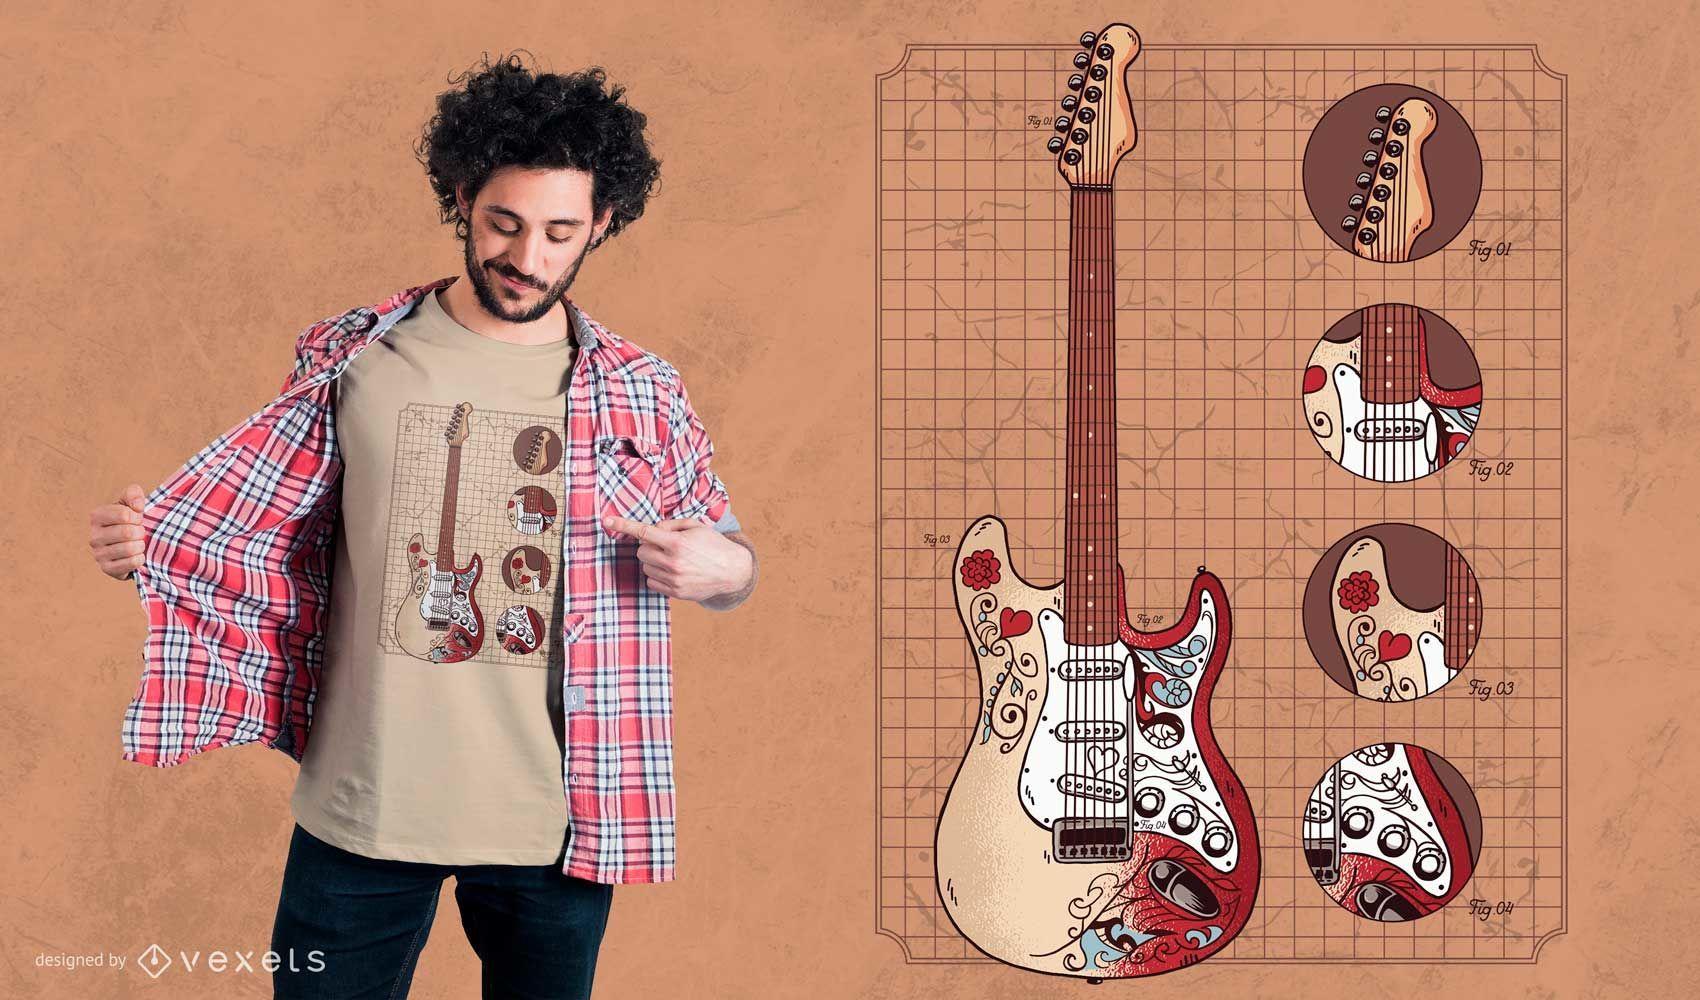 Monterey Stratocaster Guitar Illustration